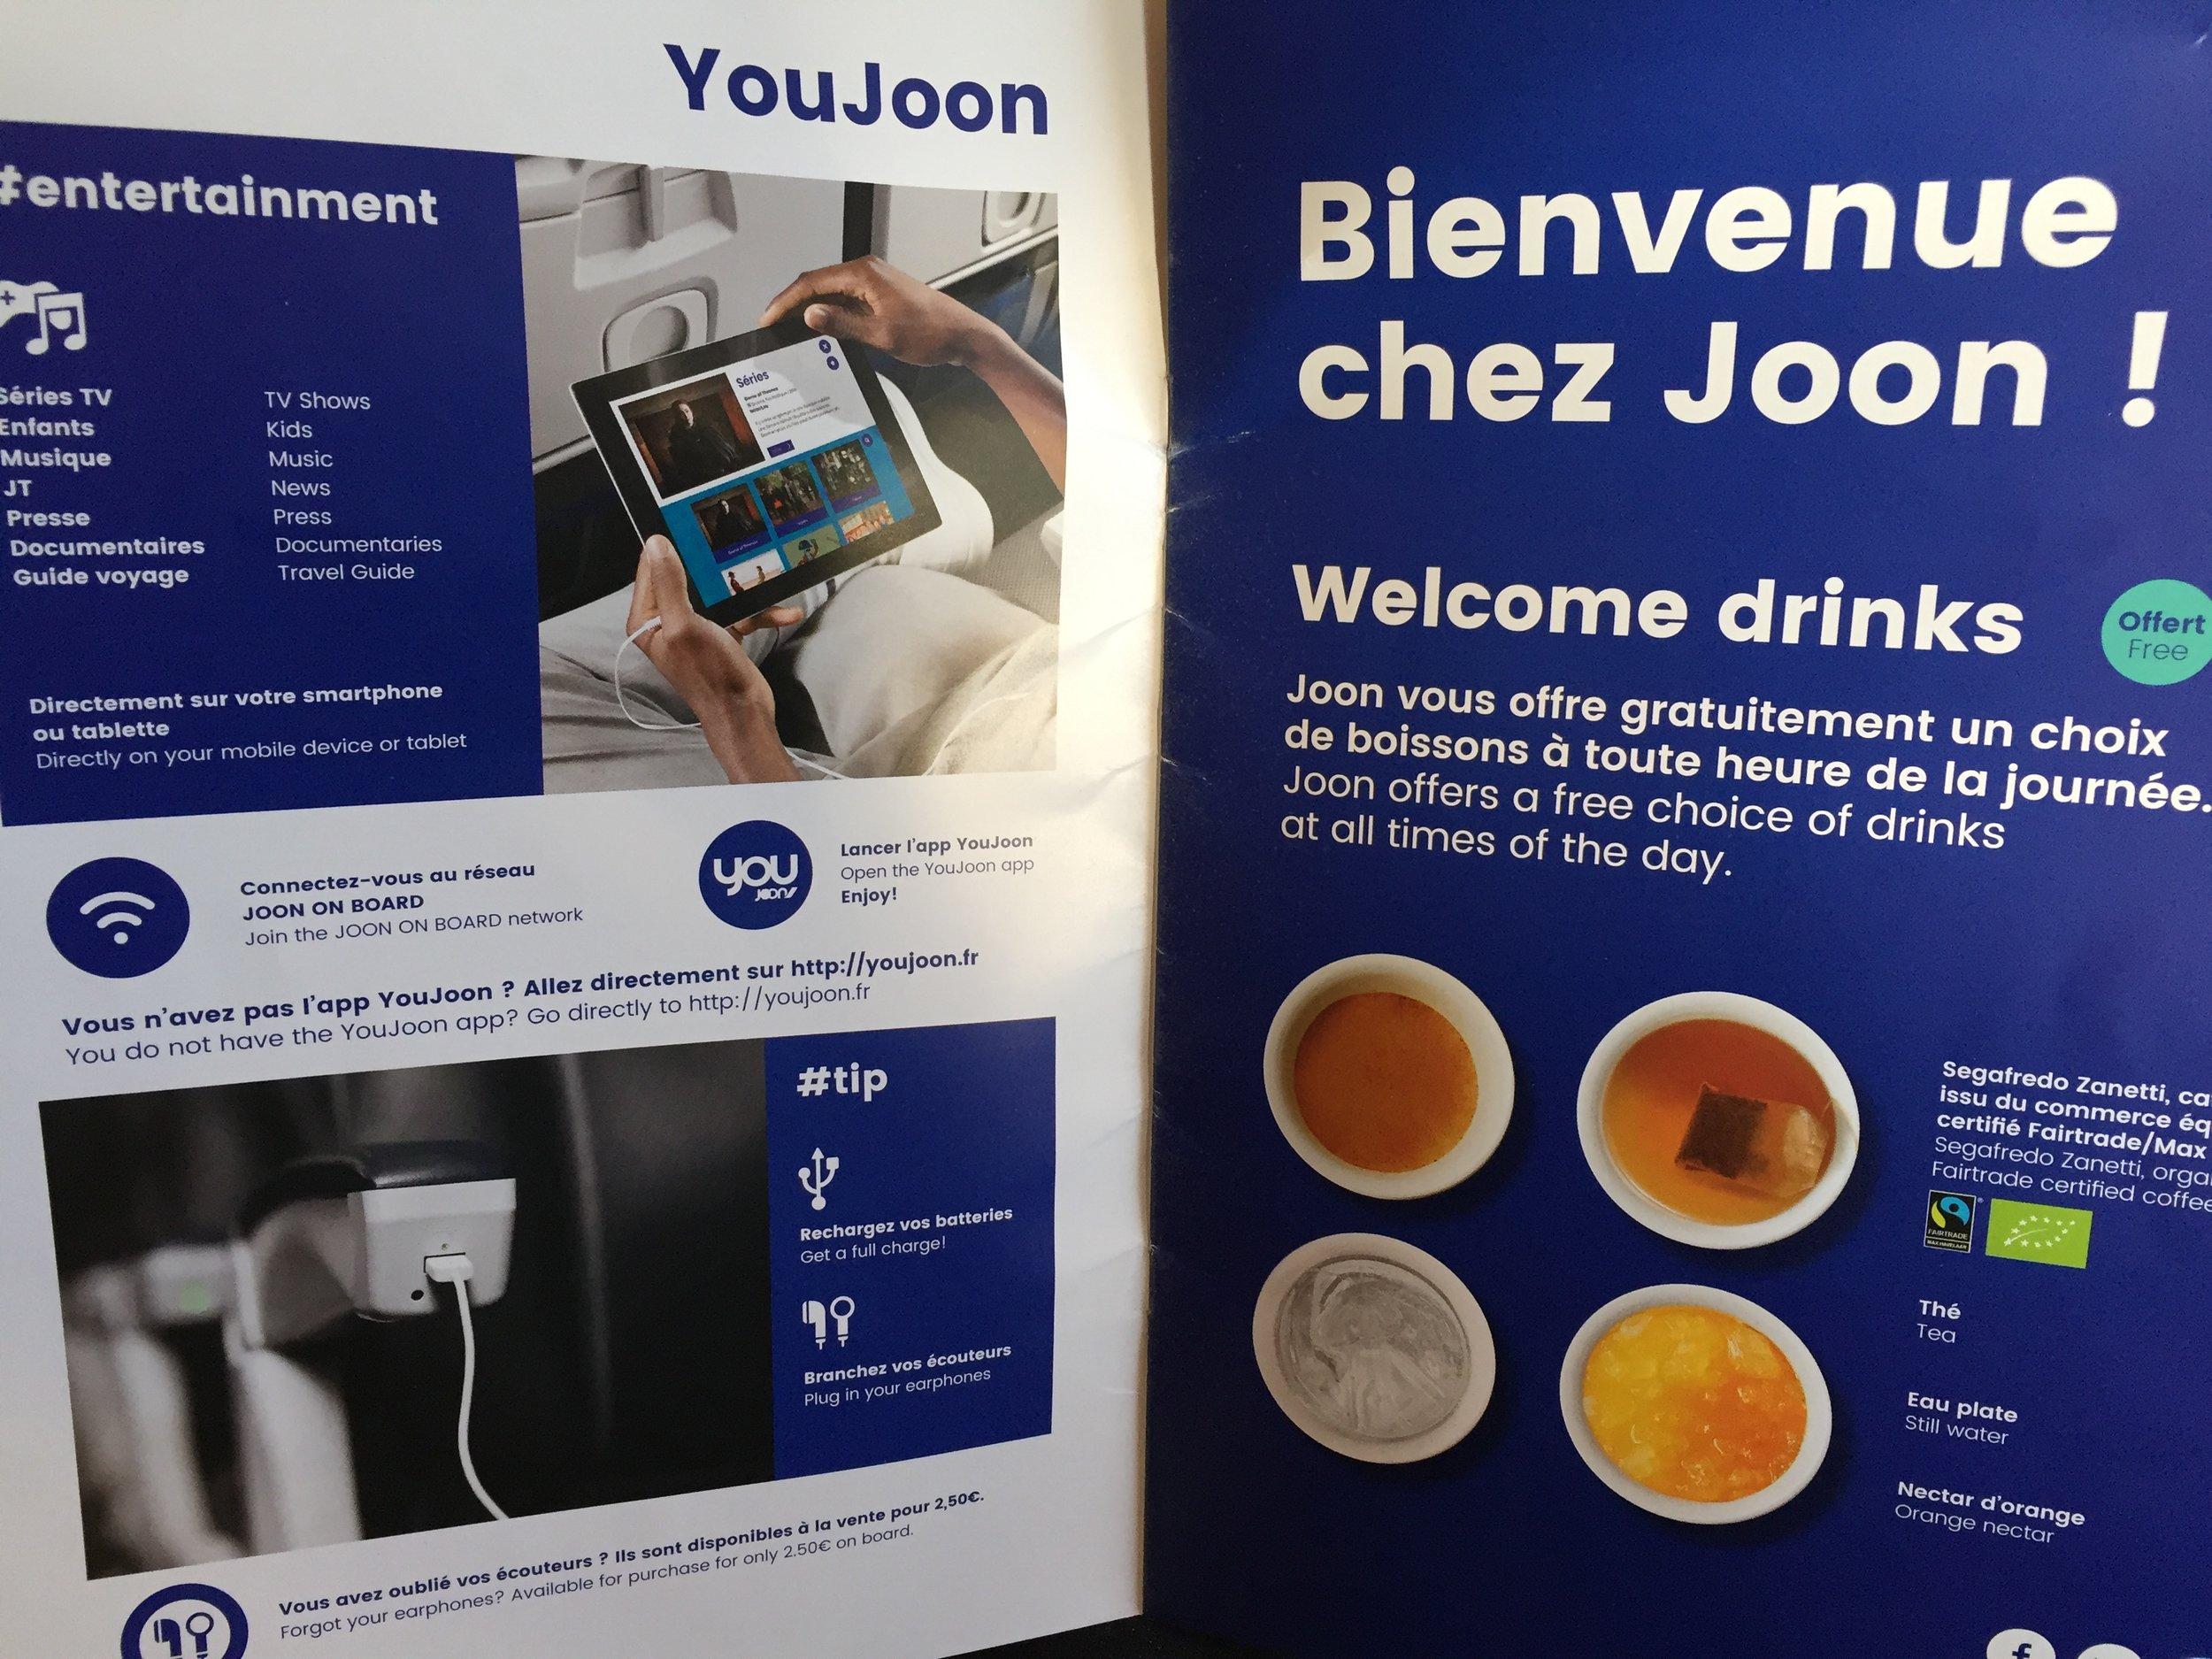 joon inflight services.JPG